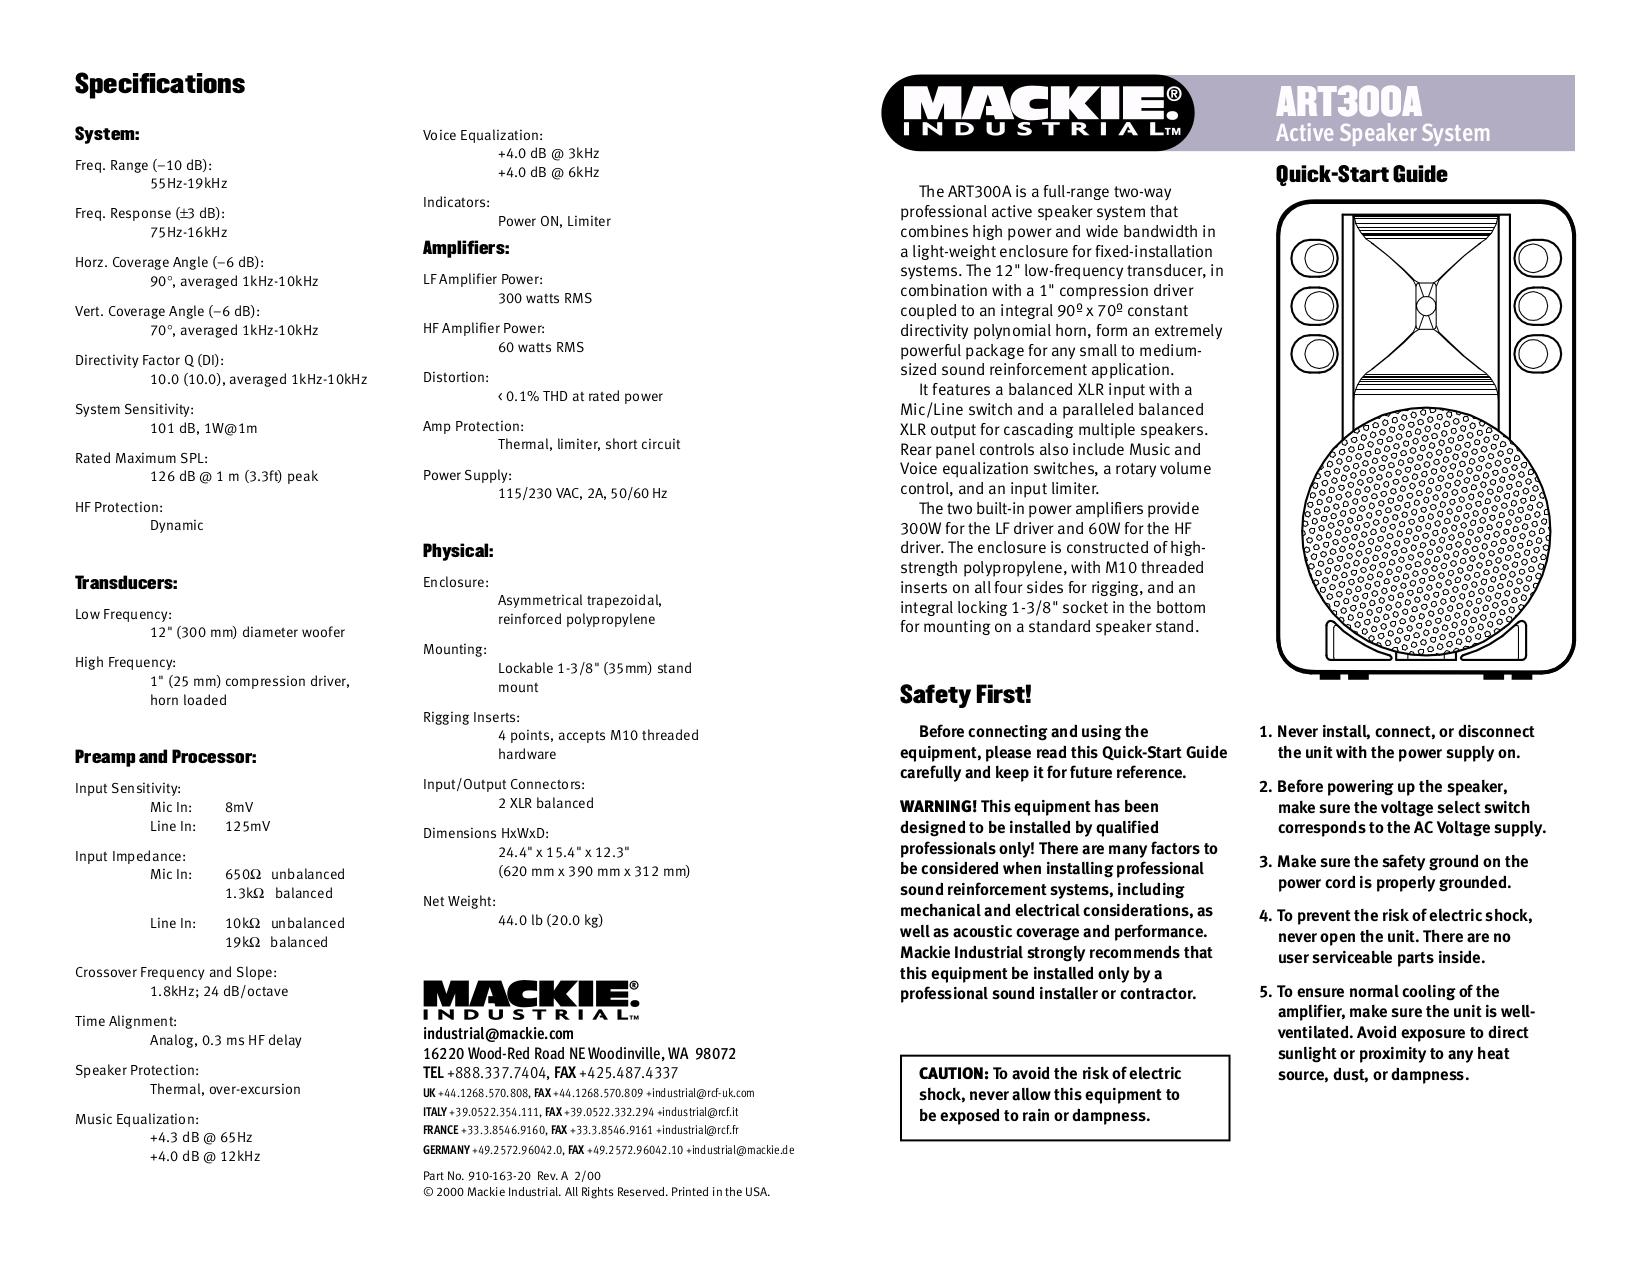 pdf for Mackie Speaker System Art Series ART300 manual